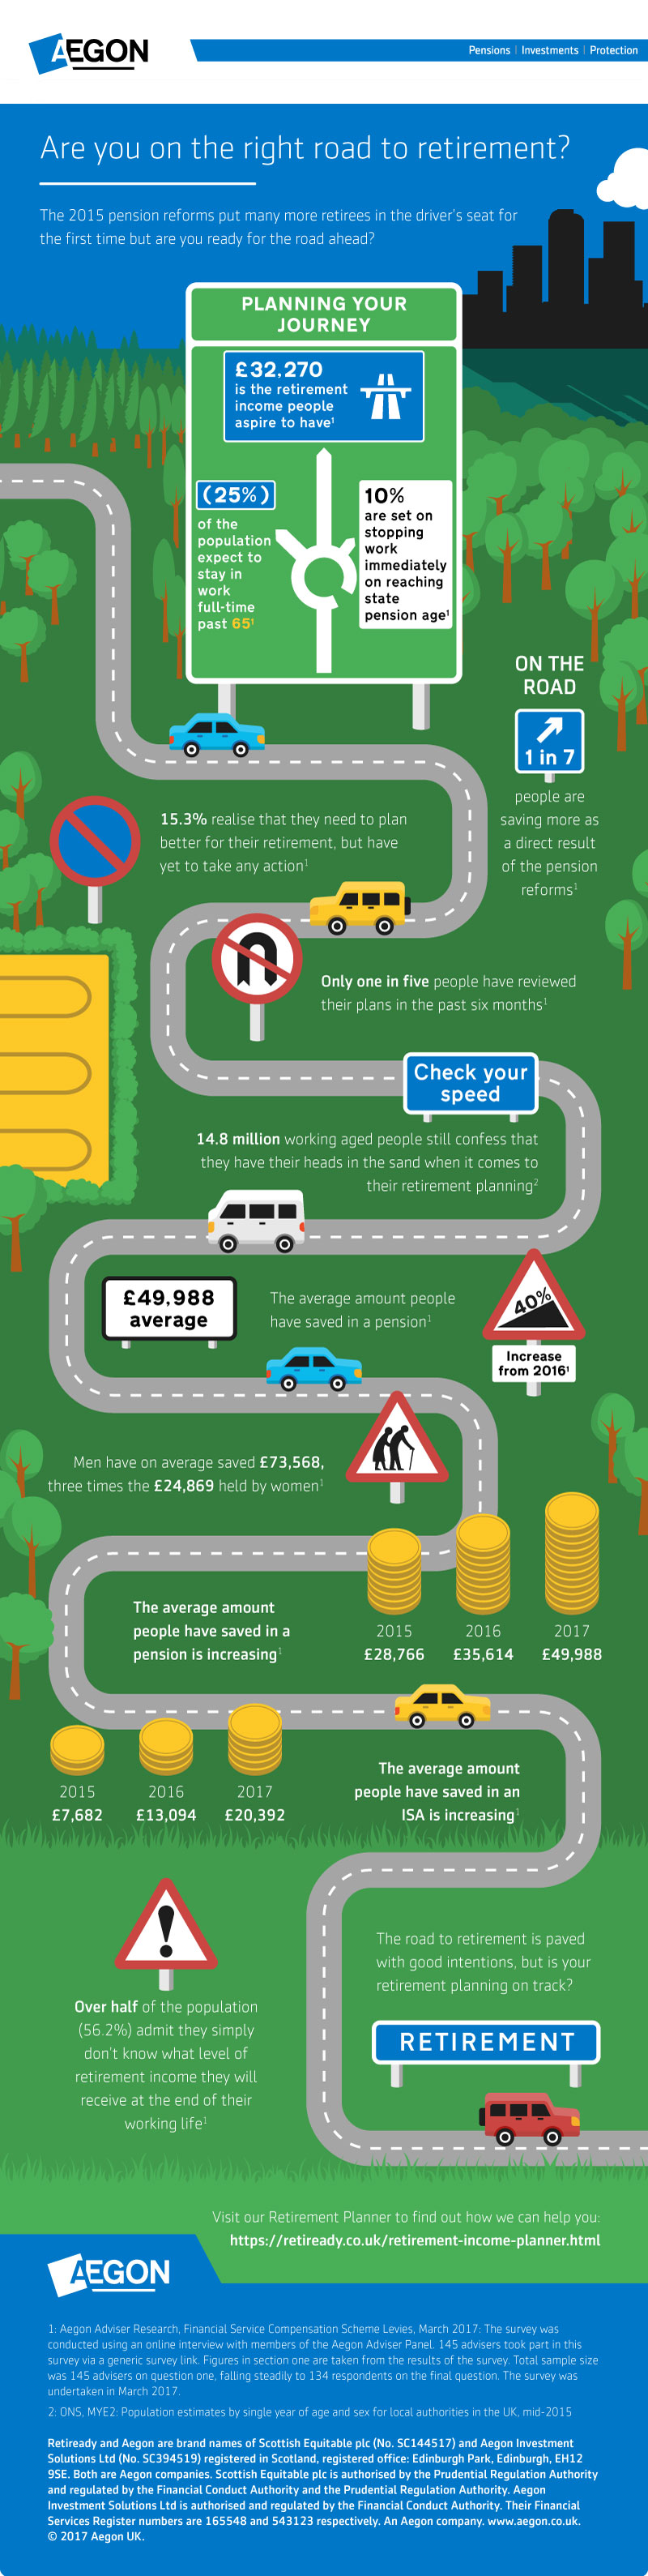 Aegon pension infographic